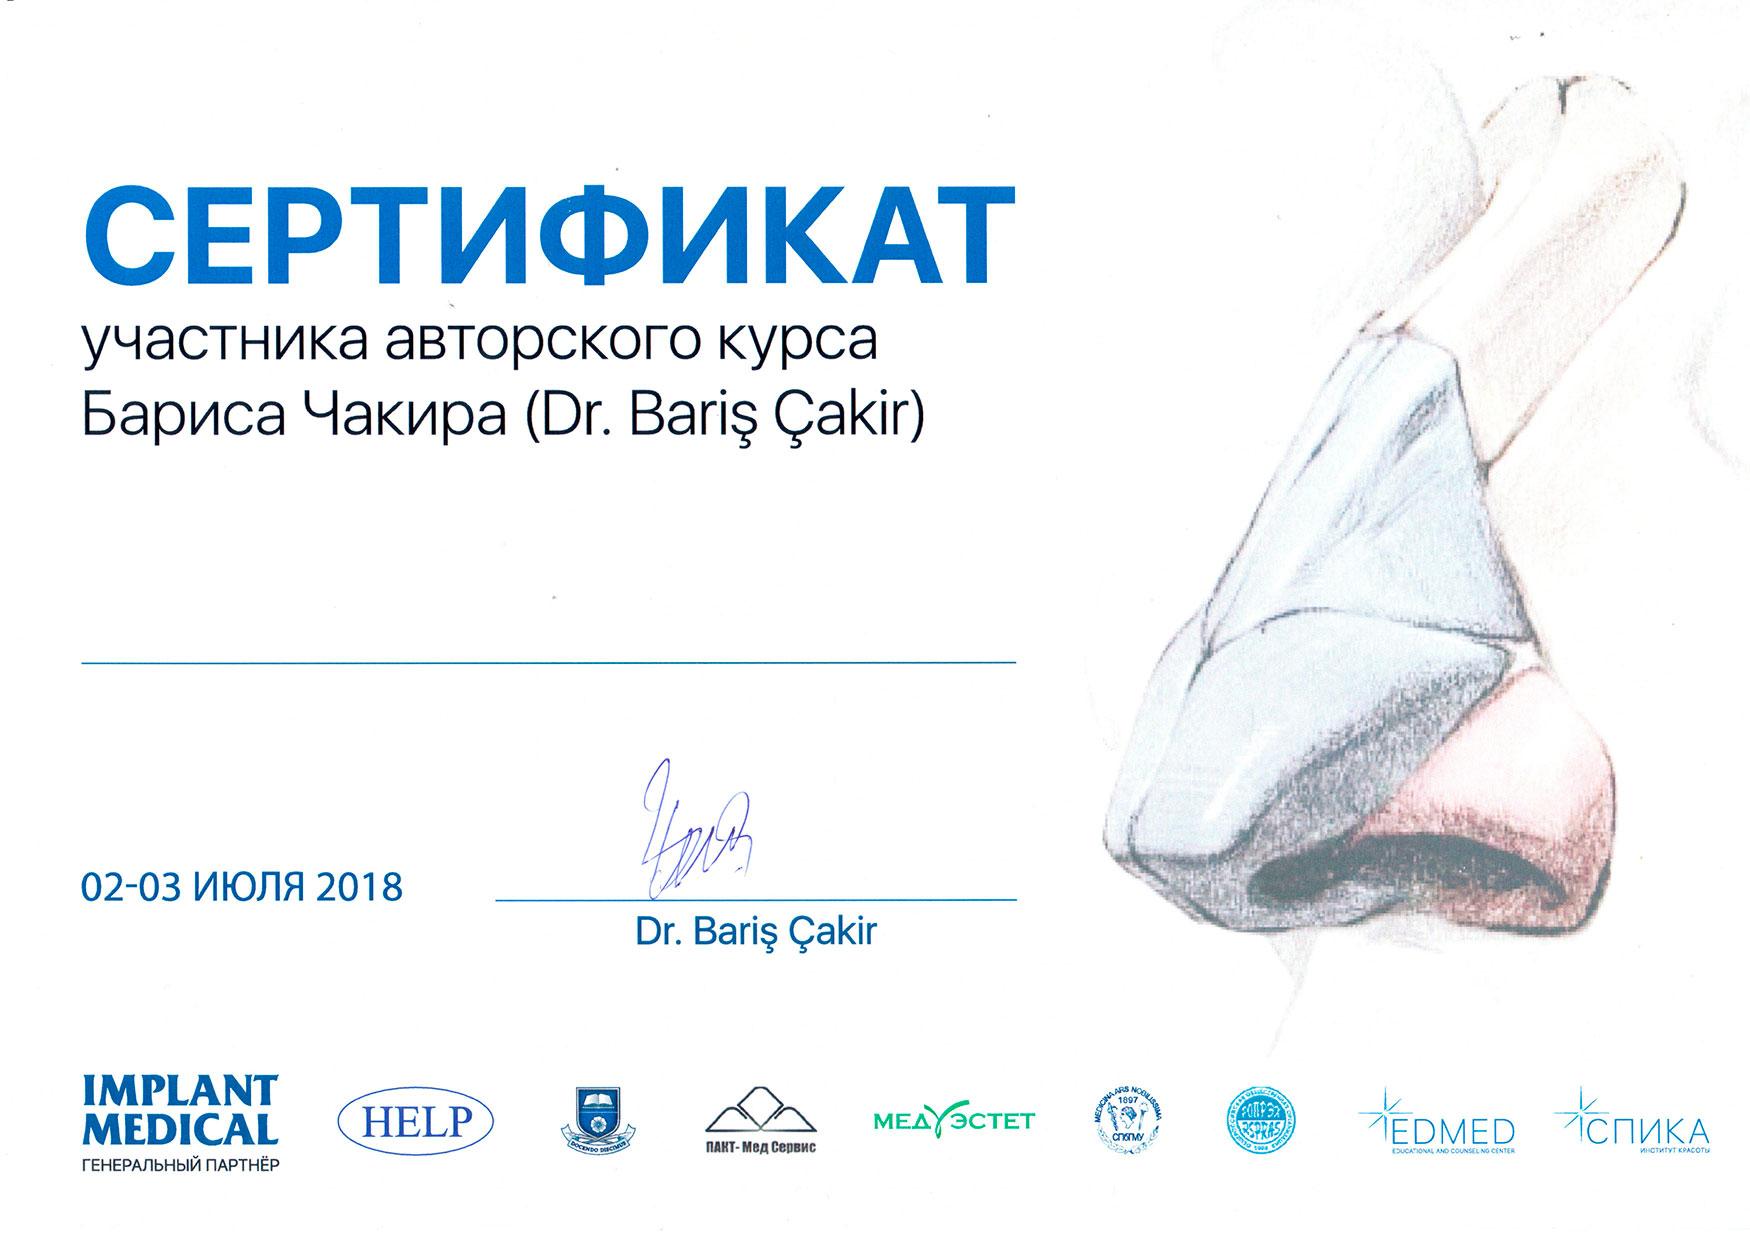 Сертификат участника авторского курса Бориса Чакира